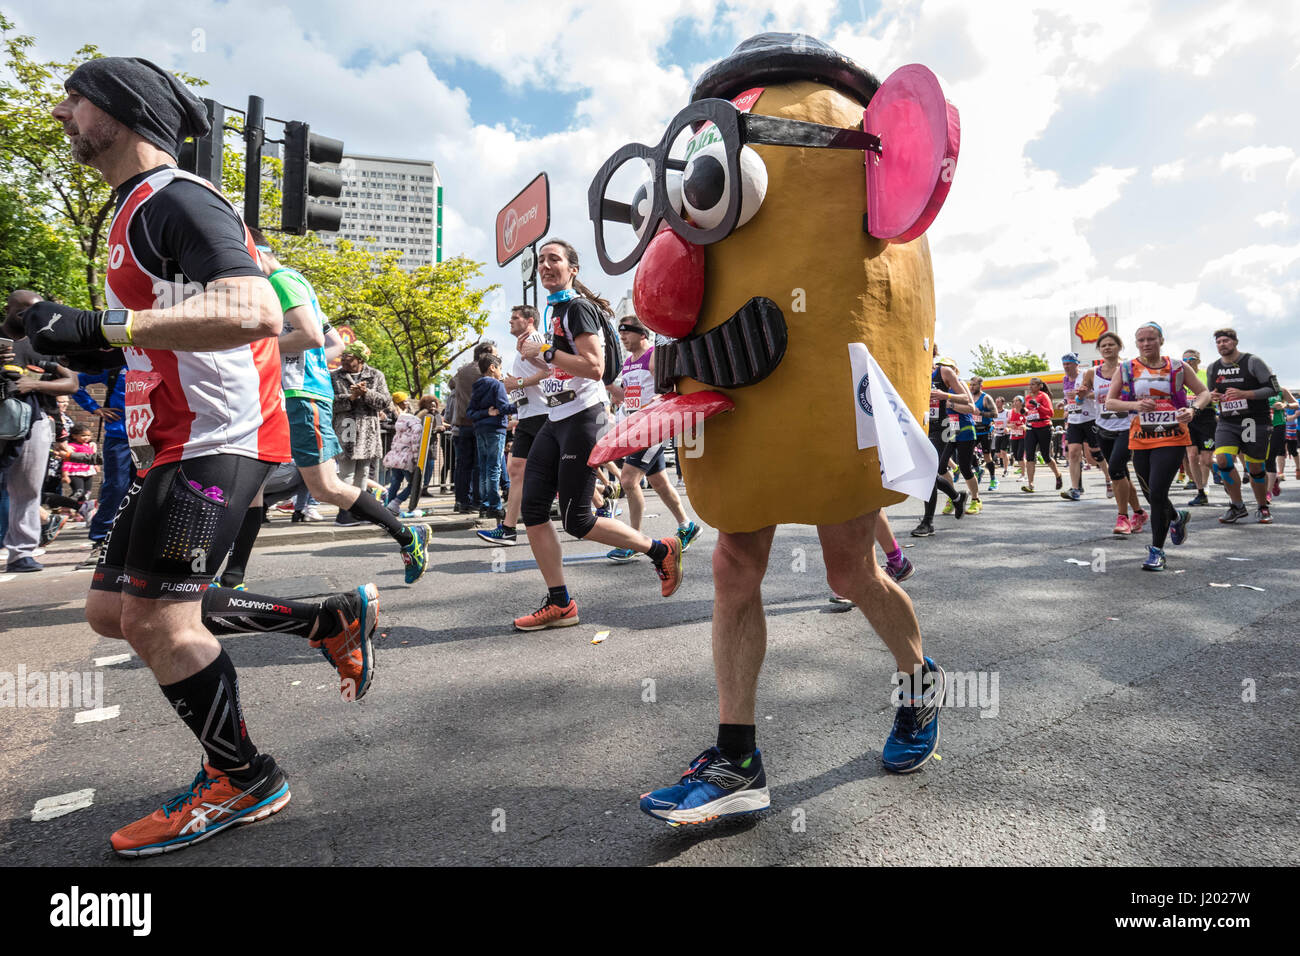 London, UK. 23rd Apr, 2017. London Marathon passes through Deptford Credit: Guy Corbishley/Alamy Live News - Stock-Bilder